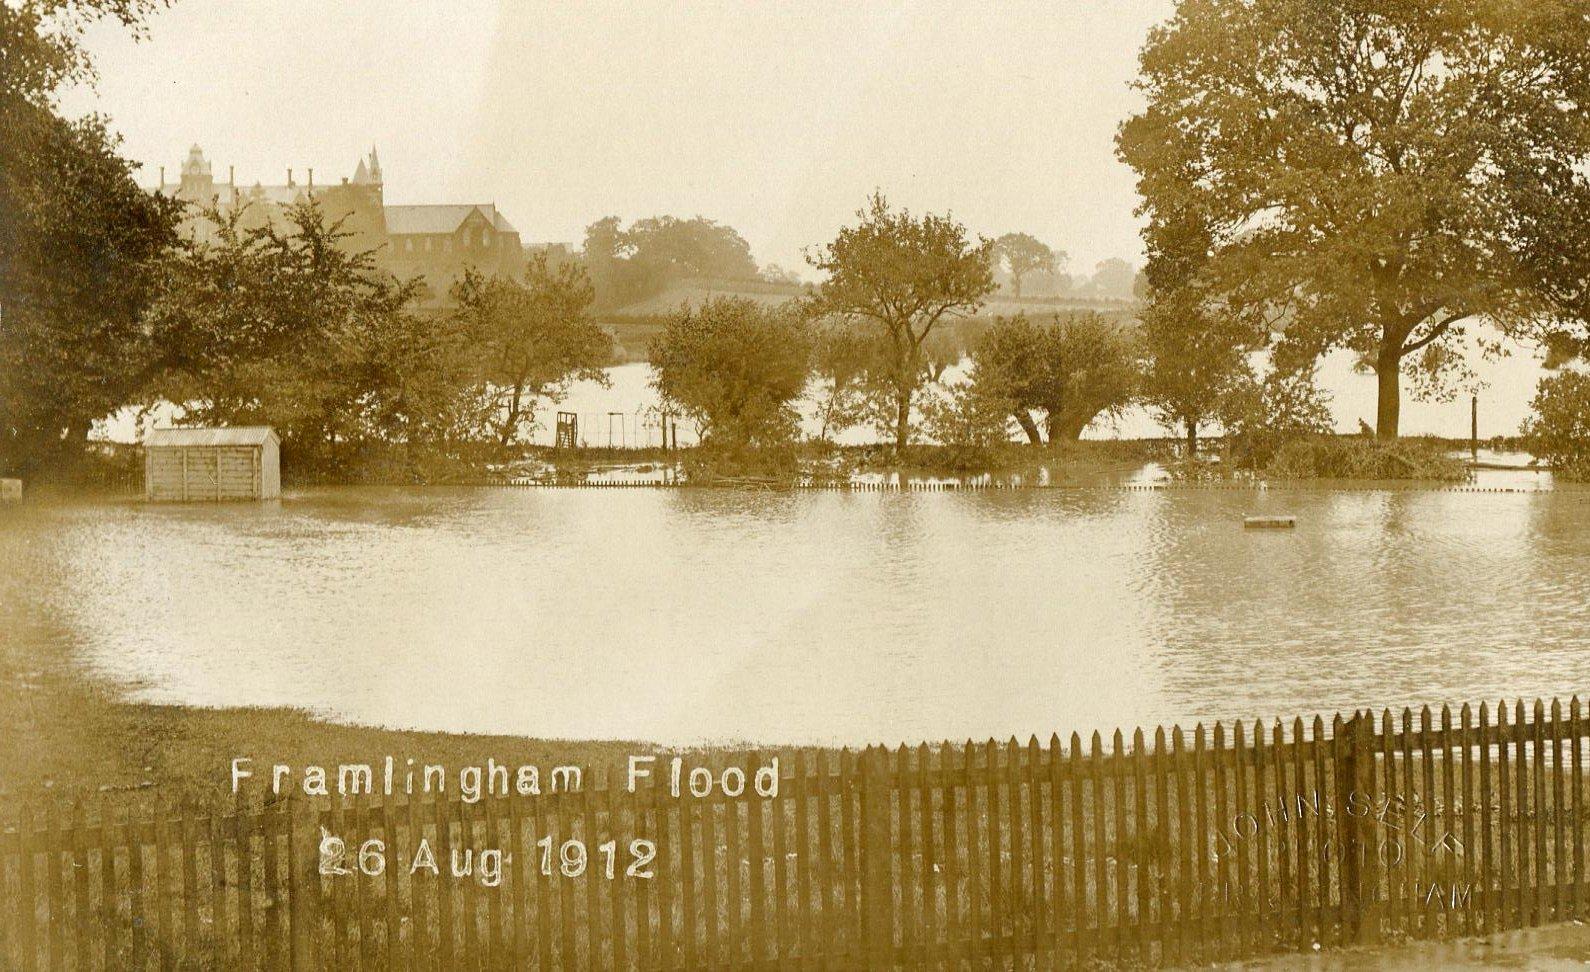 Sale Yard flood, 1912